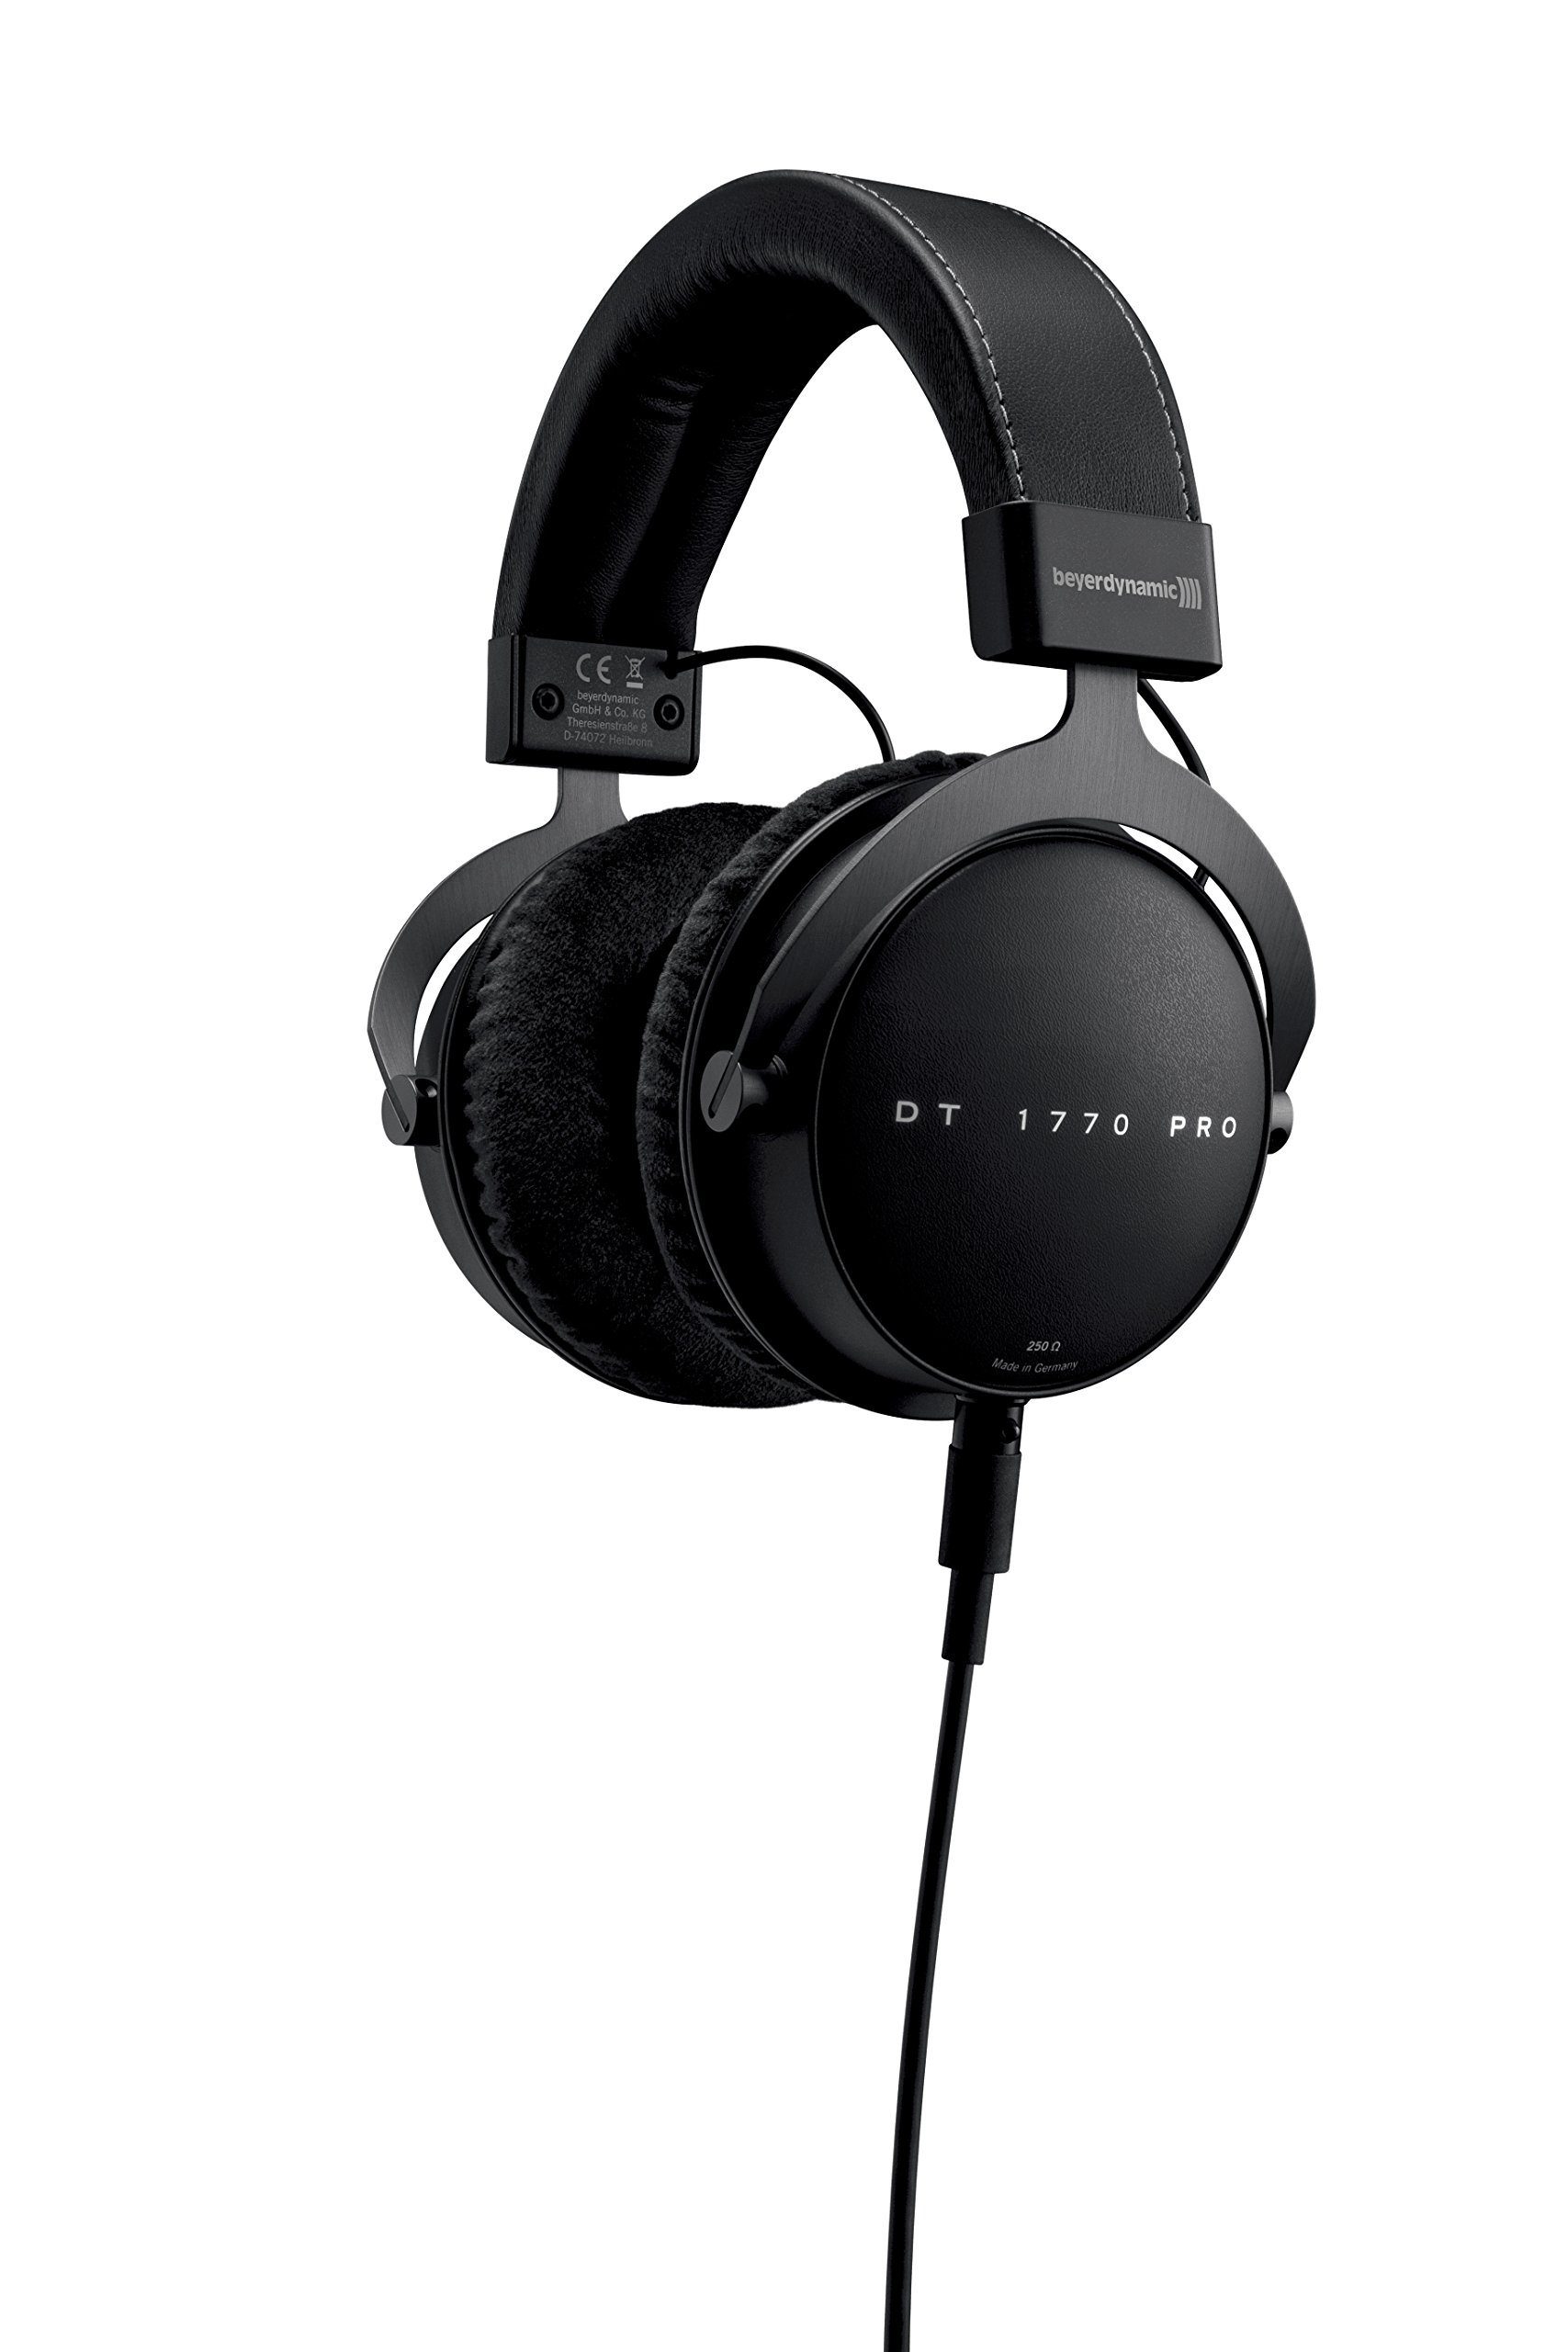 beyerdynamic DT 1770 Pro Studio Headphone